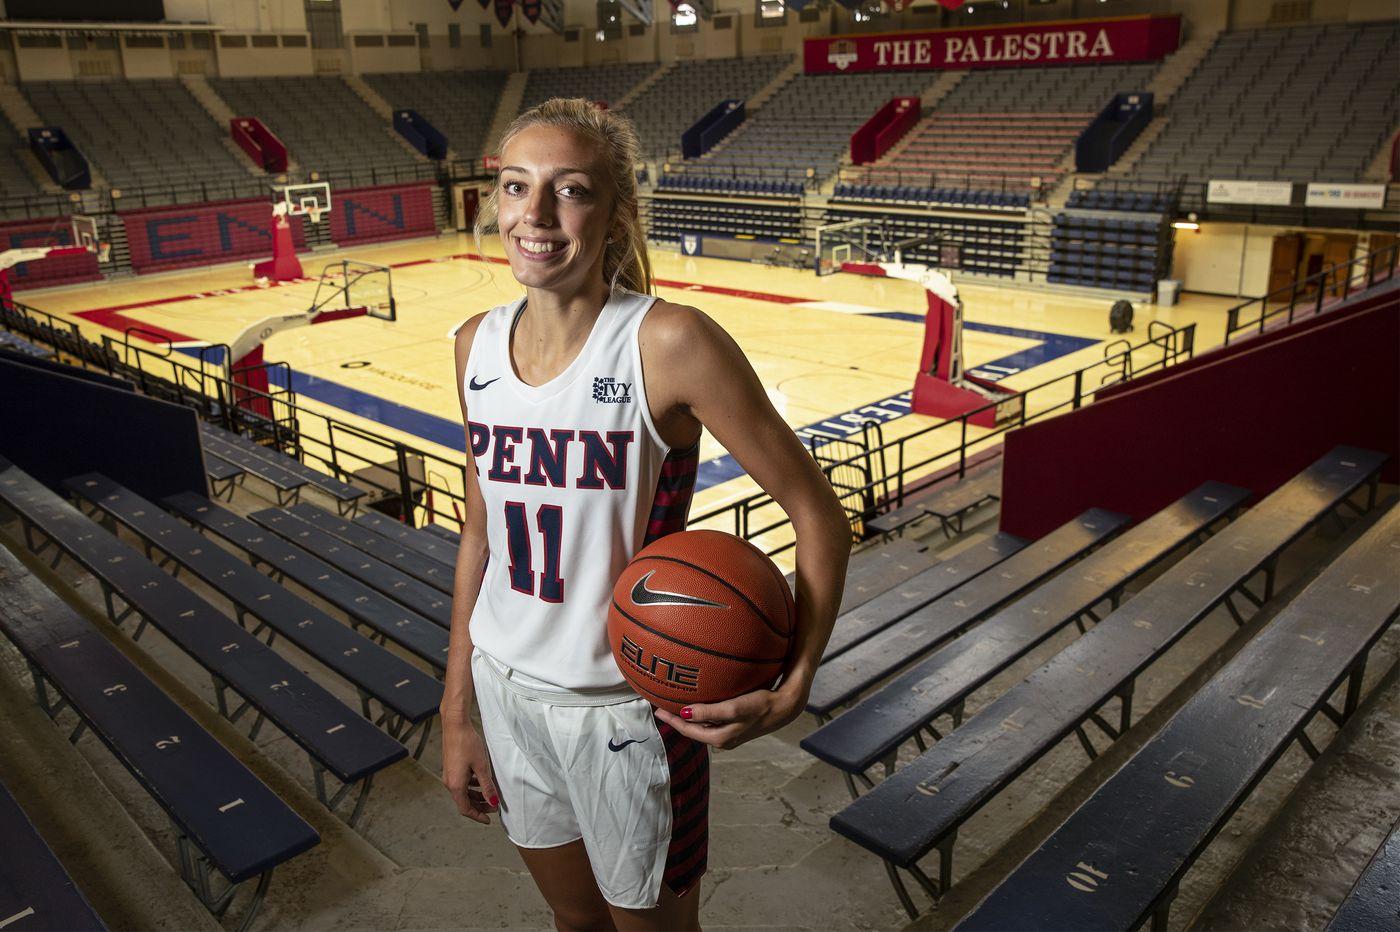 Women's City Six basketball: Penn's historic start continues, St. Joe's Jekot notches first double-double